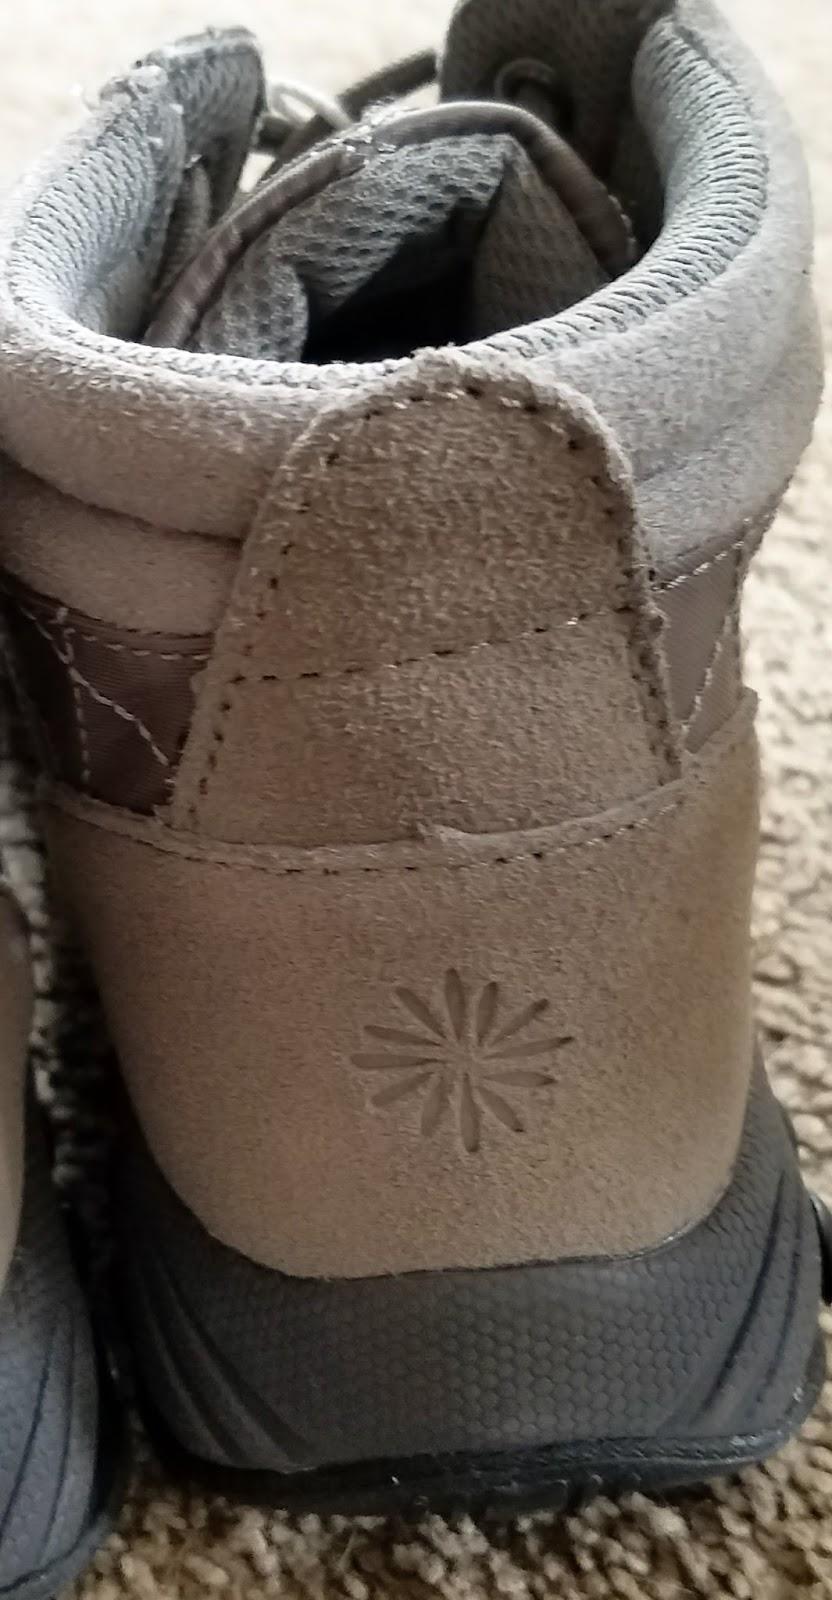 Decent Walking Shoes At Walmart